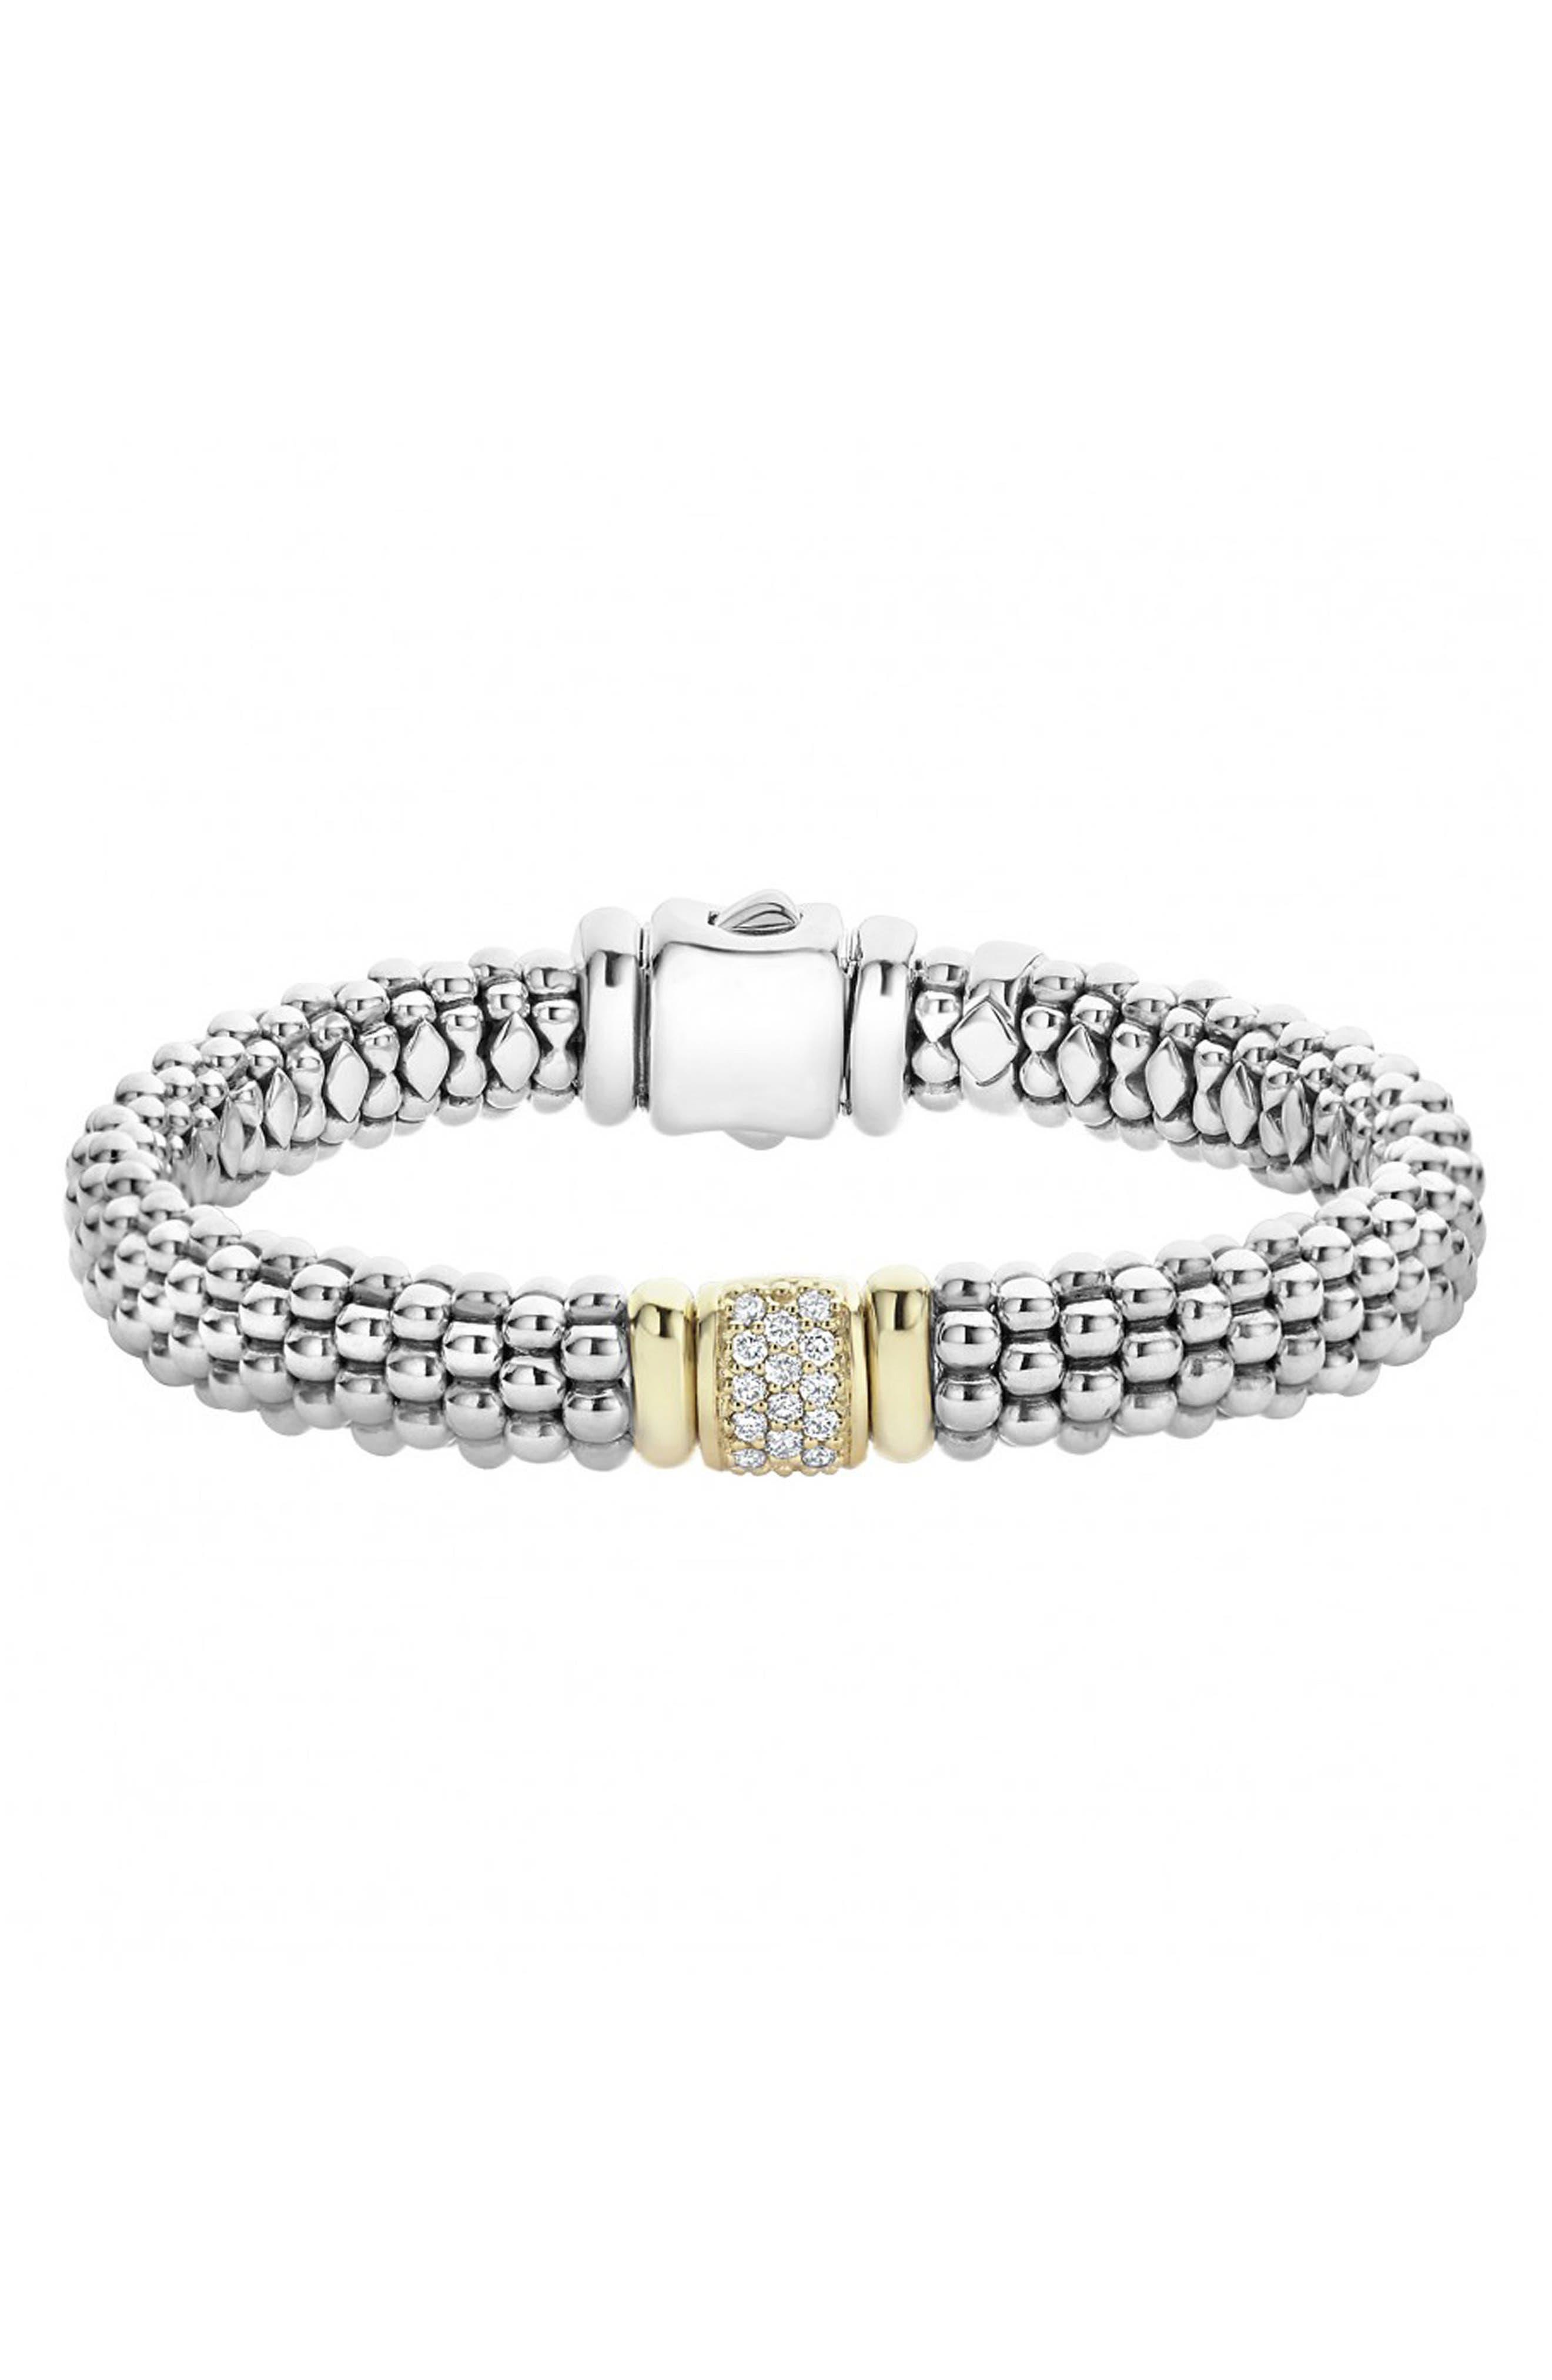 Caviar & Diamond Bracelet,                             Main thumbnail 1, color,                             STERLING SILVER/ GOLD